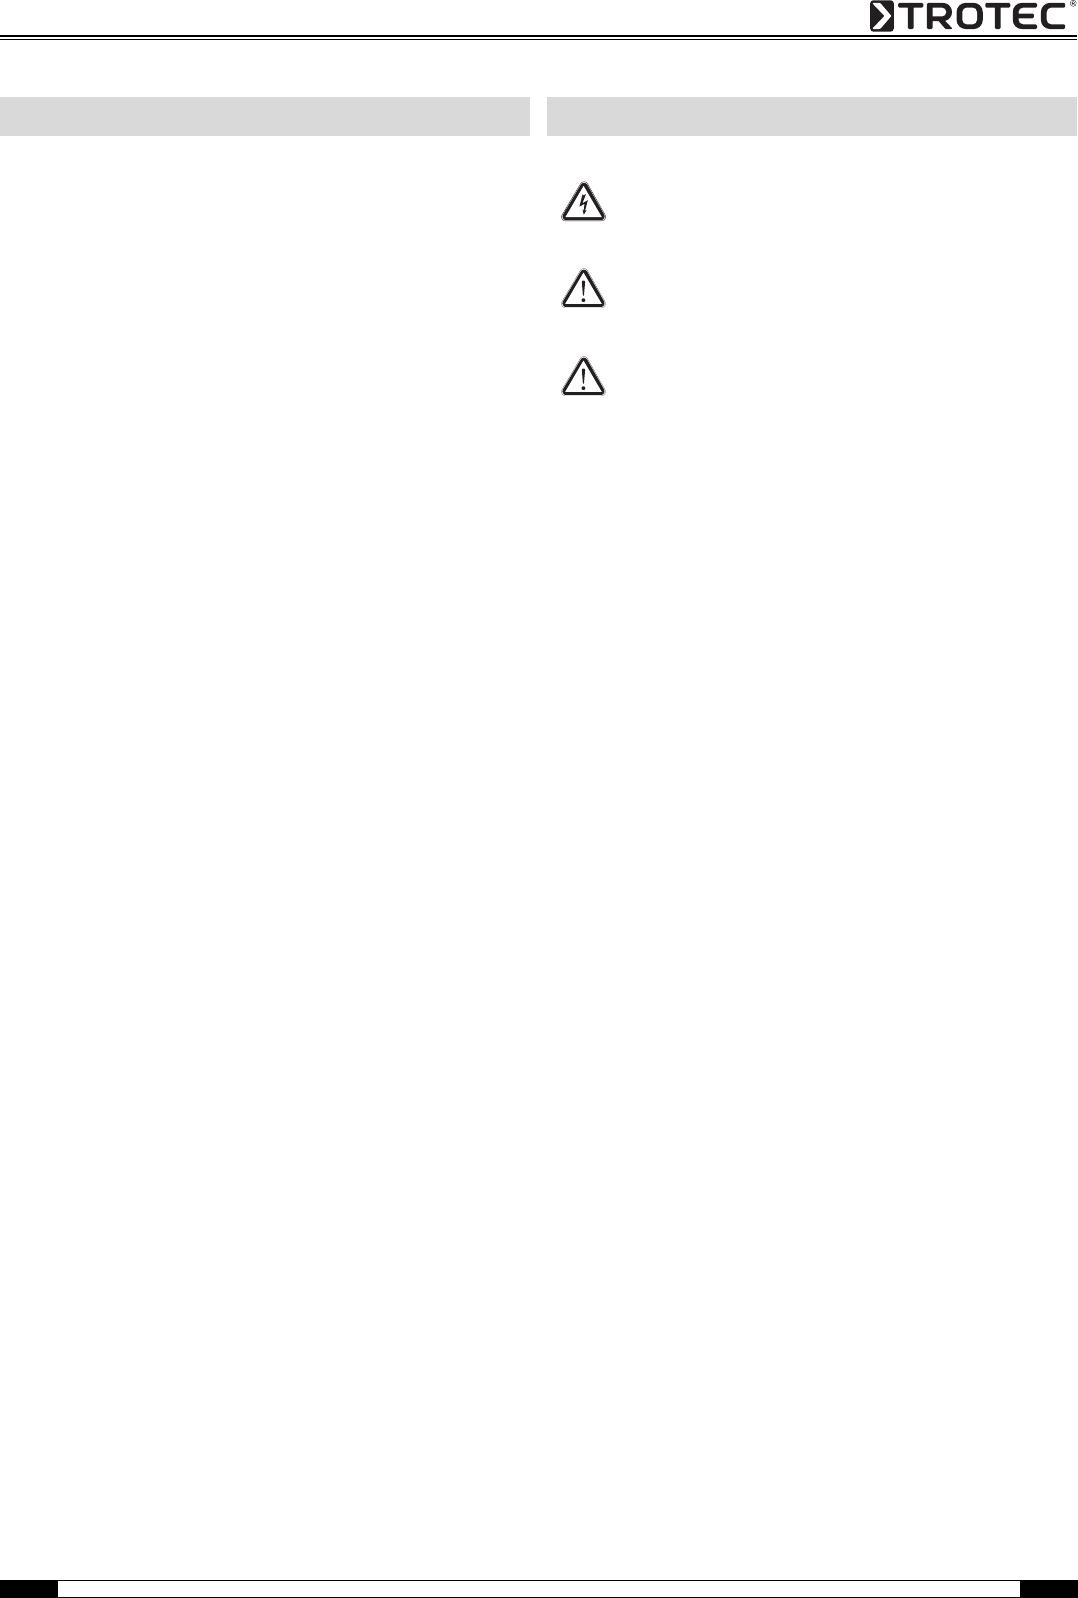 Handleiding Trotec DH 30 AX (pagina 1 van 21) (Deutsch)